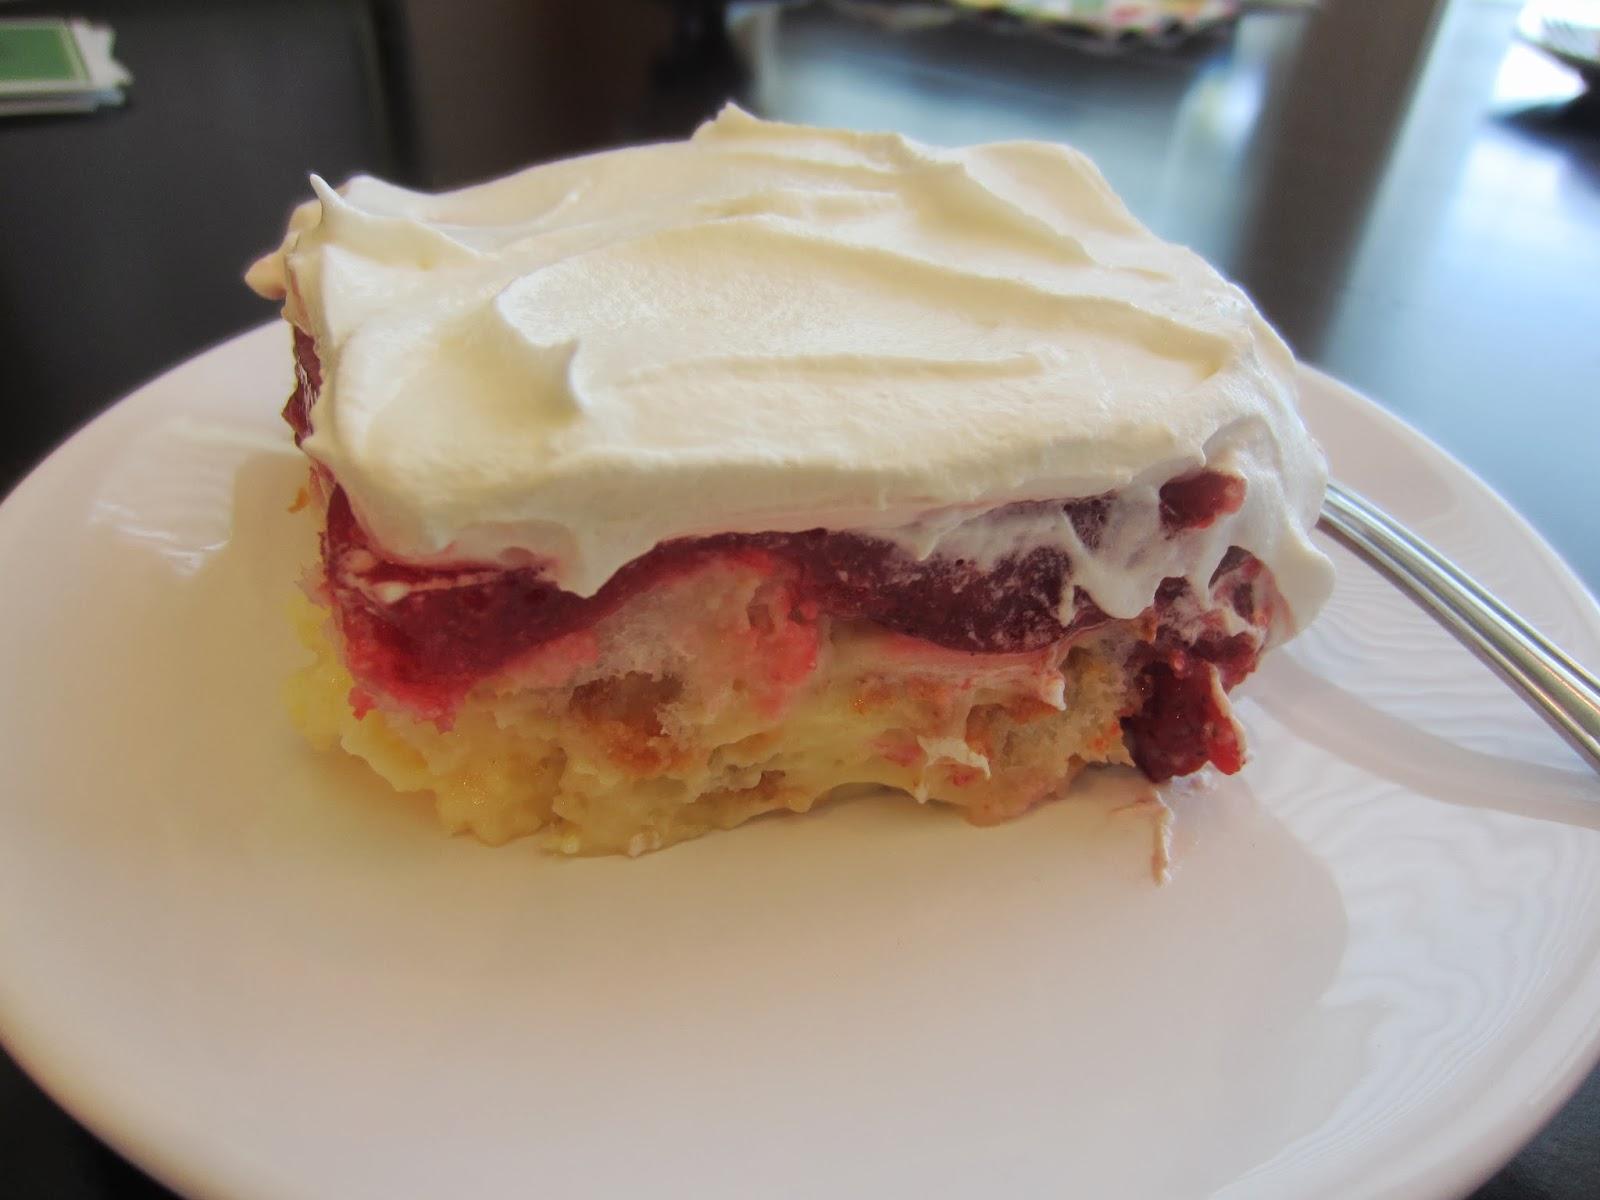 Strawberry Jello Angel Food Cake Dessert